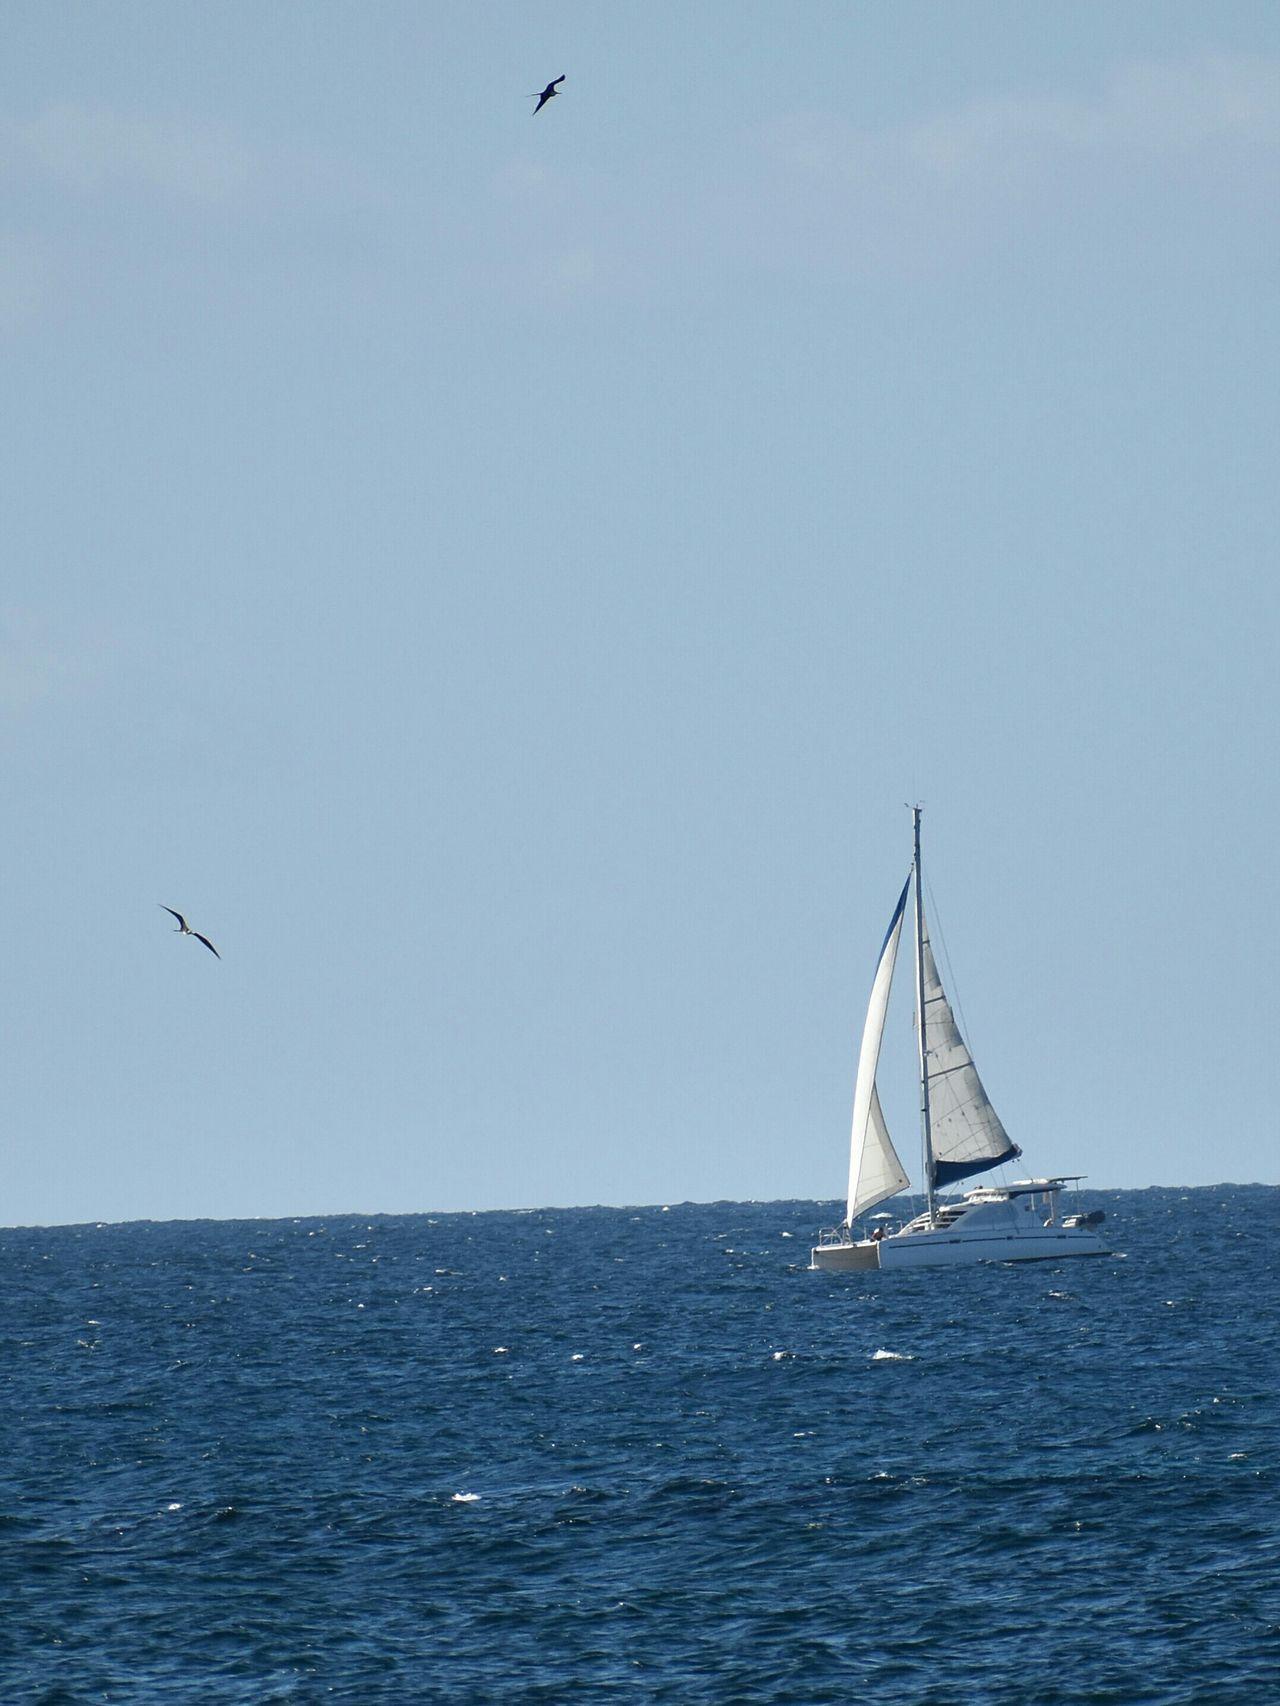 Nautical Vessel Sailboat Sailing Sea Blue Transportation Sky Outdoors Sailing Ship Bird Vacations Day No People Water Wave Yacht Yachting